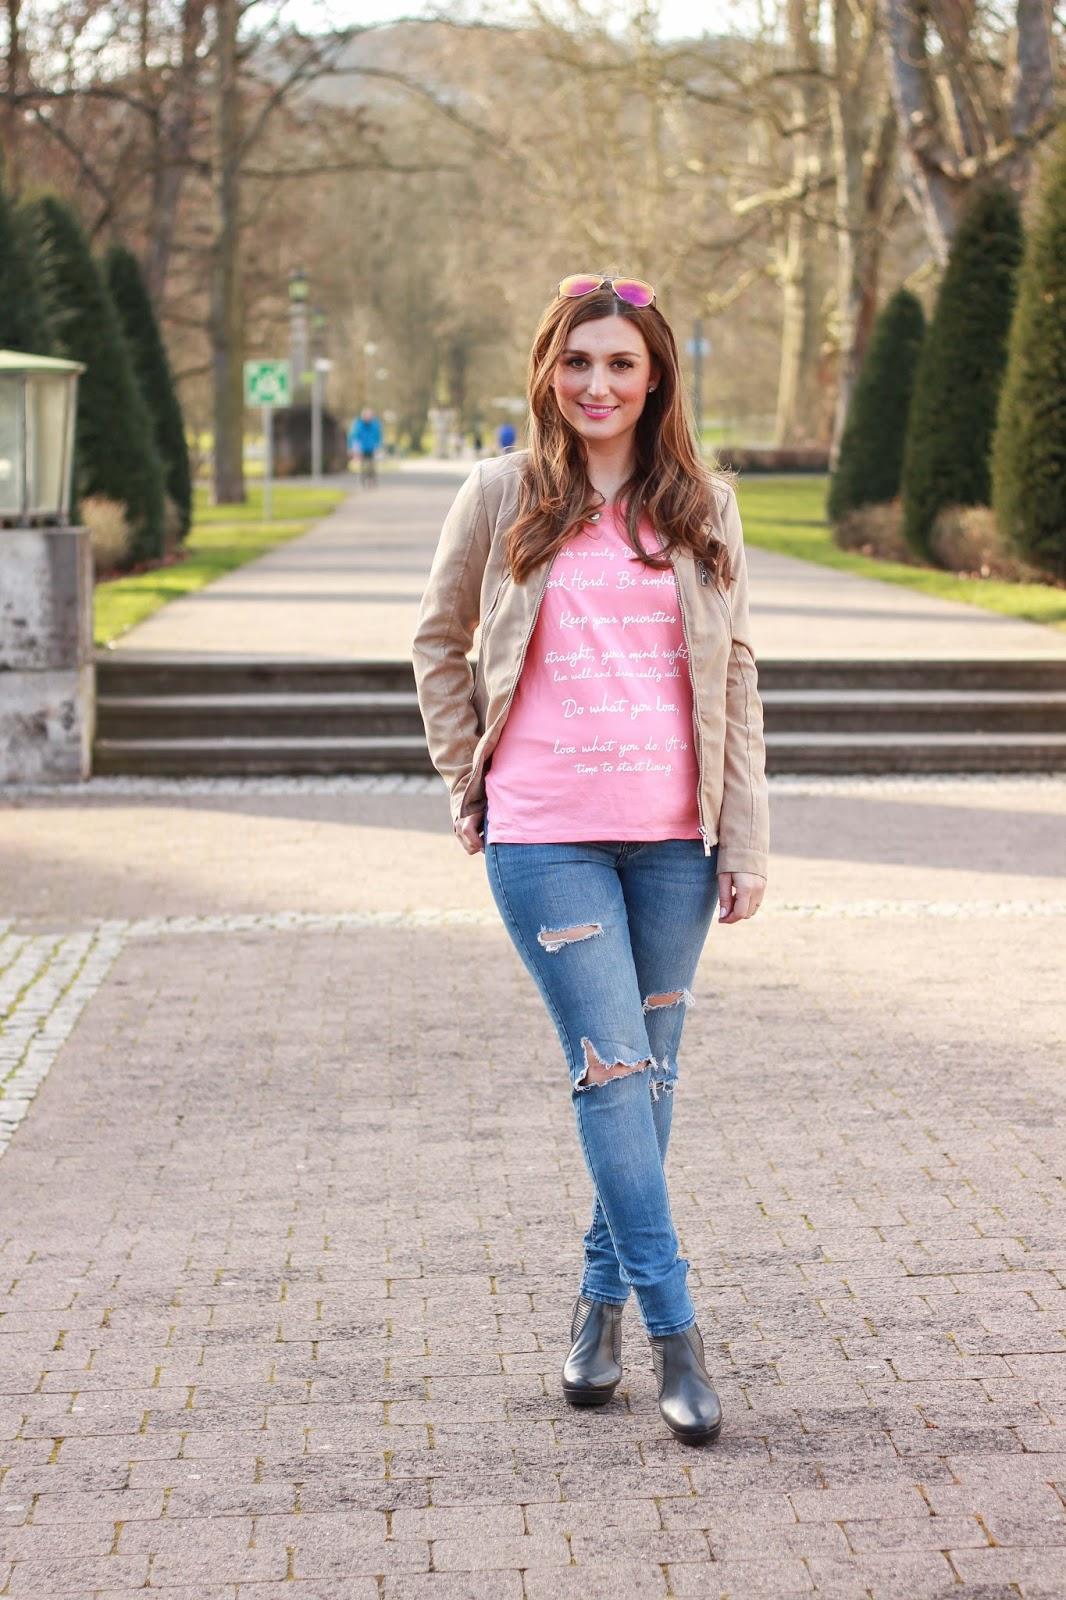 Frühlingslook - Springlook - Springoutfit - Blogger - German Fashionblogger - Deutsche Fashionblogger - Fashionblog - Modeblogger  Blogger mit Lederjacke